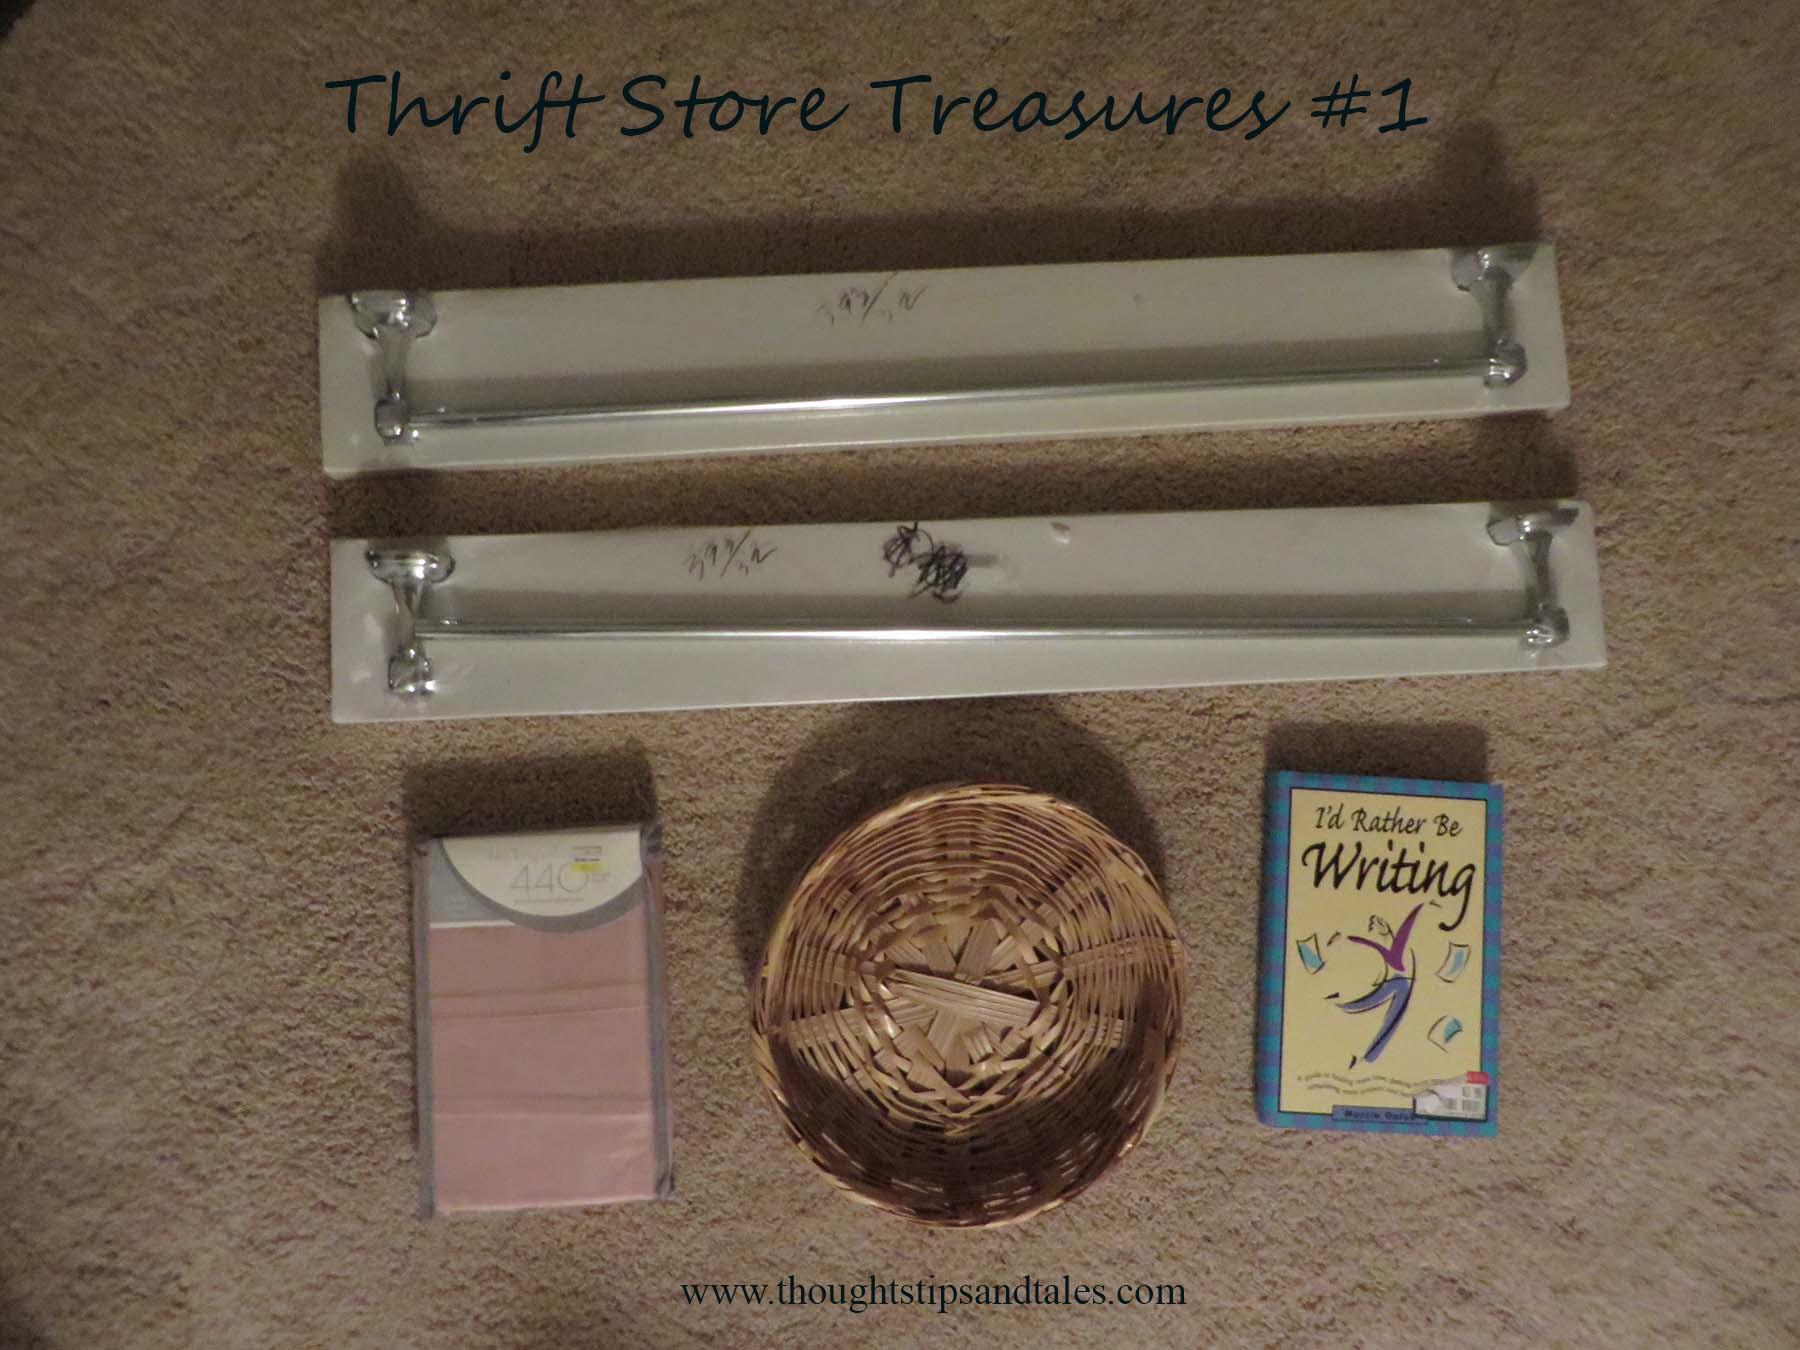 Thrift Store Treasures #1